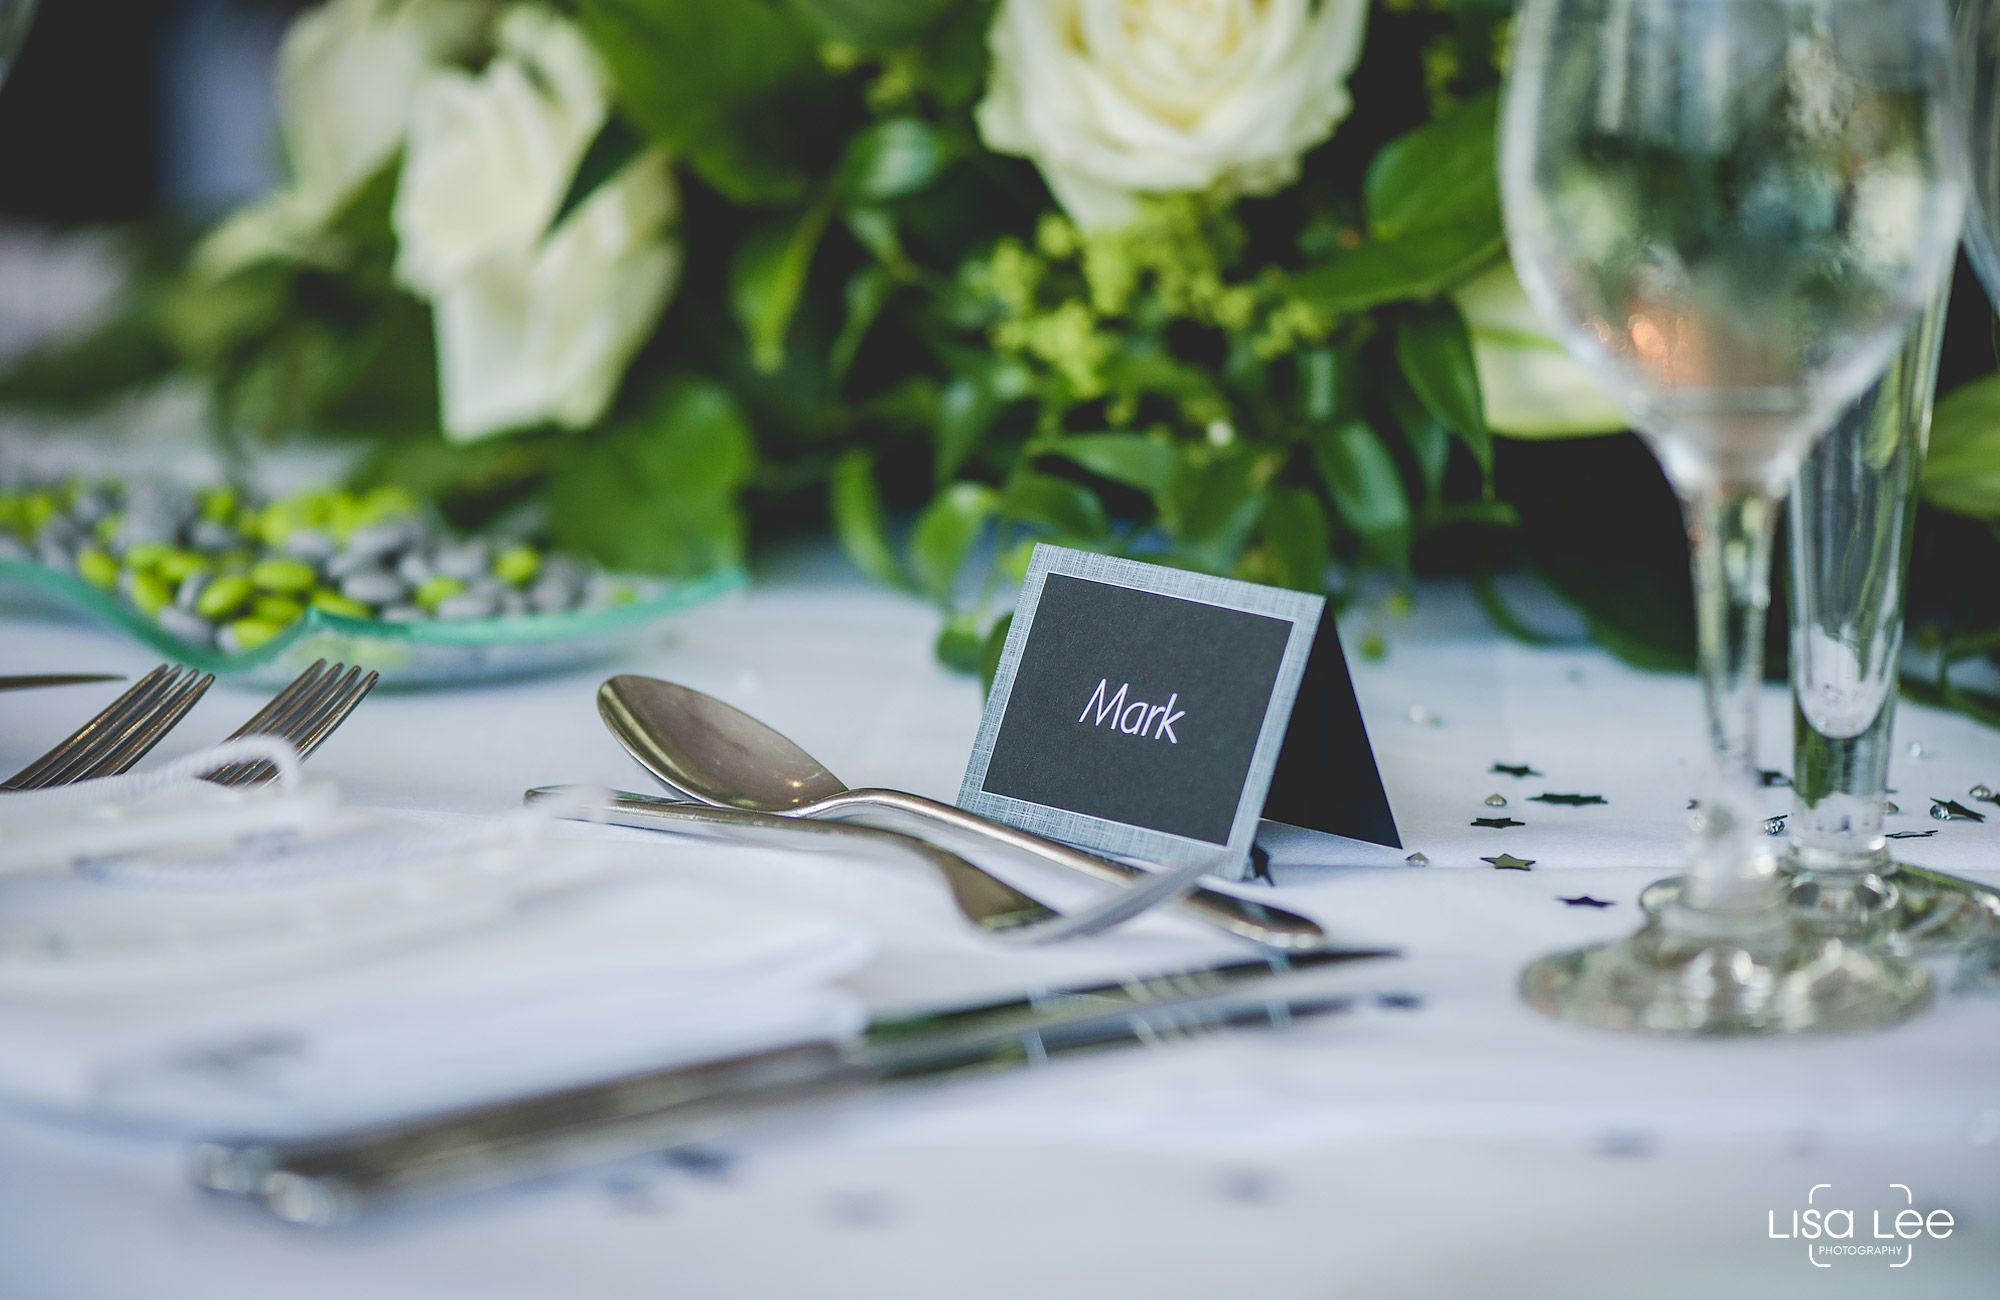 lisa-lee-wedding-photography-christchurch-dorset-placemats.jpg